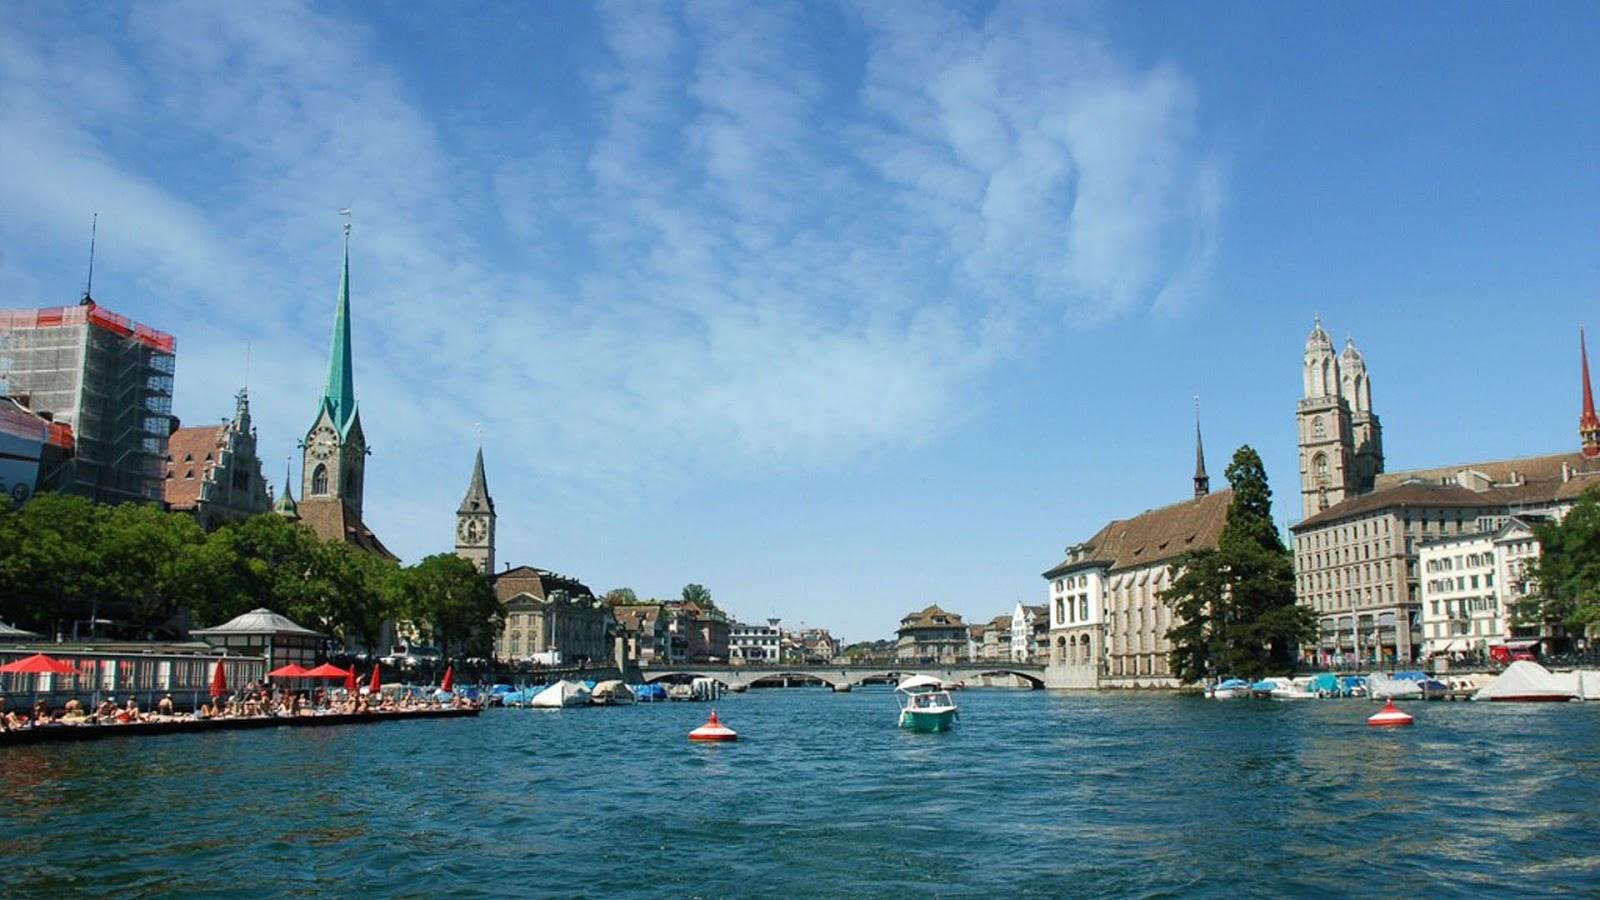 London Wallpaper Hd 1920x1080 World Beautifull Places Zurich Switzerland